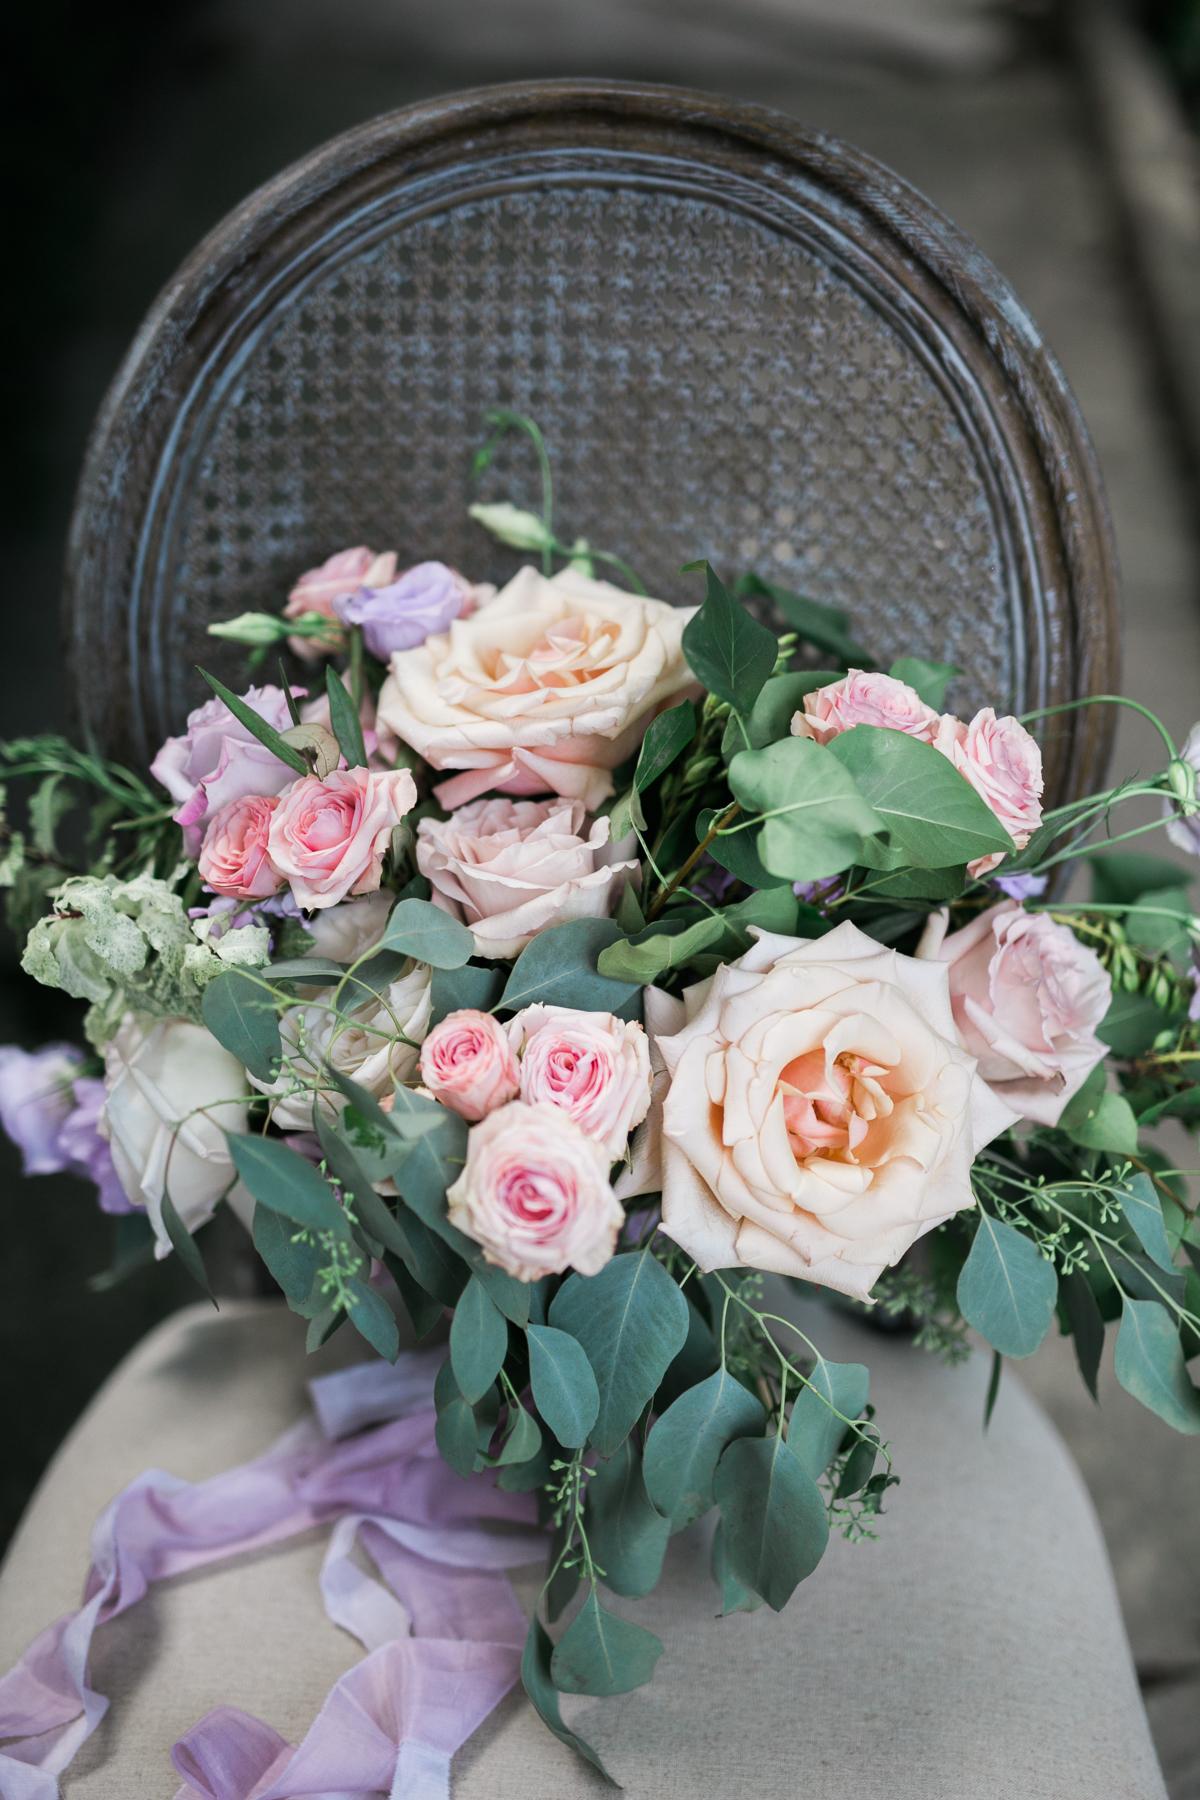 August In Bloom - Pastel bouquet - Fairytale Wedding (Wedluxe)